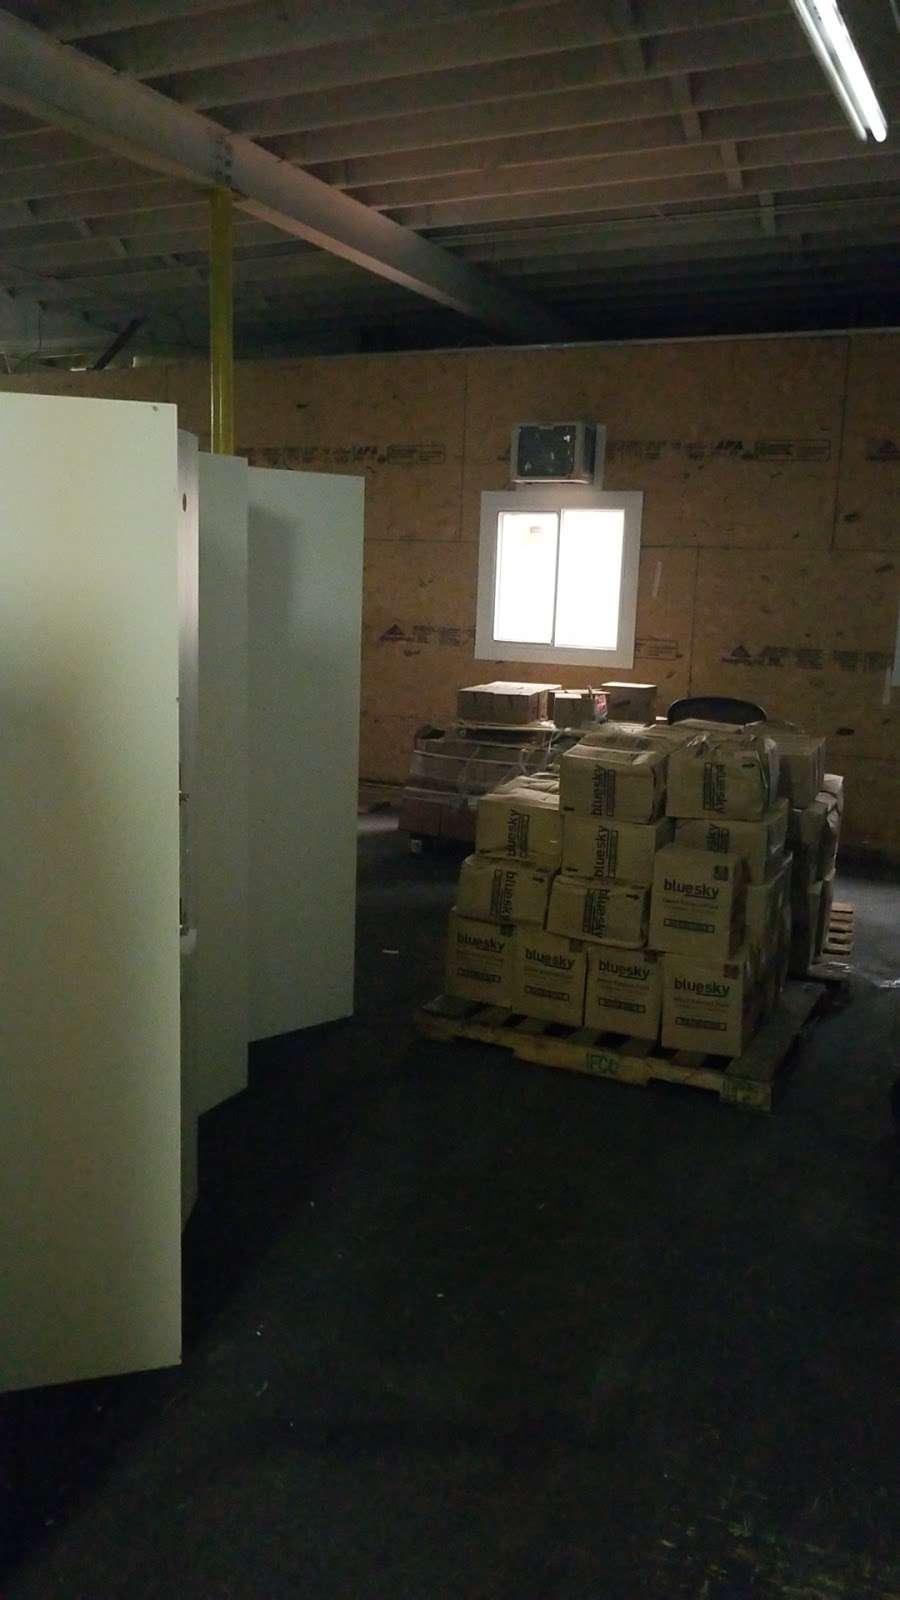 Cross Docking and Storage Services - storage  | Photo 4 of 4 | Address: Street B, Carlstadt, NJ 07072, USA | Phone: (973) 928-6868